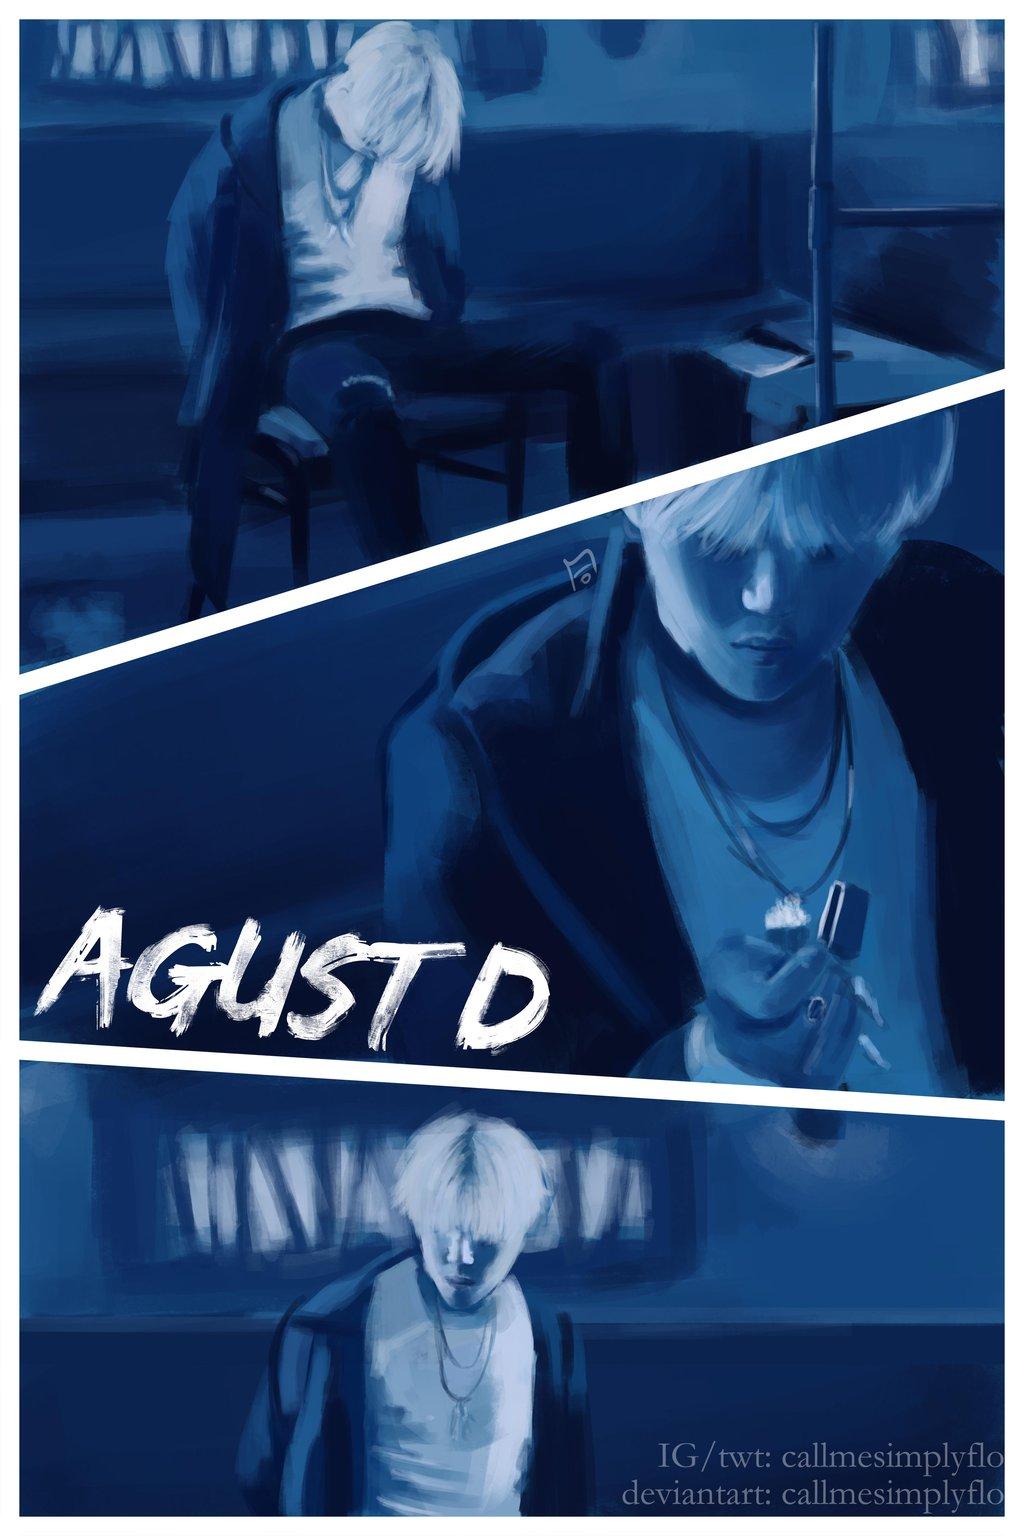 AGUST D by CallmesimplyFlo 1024x1536